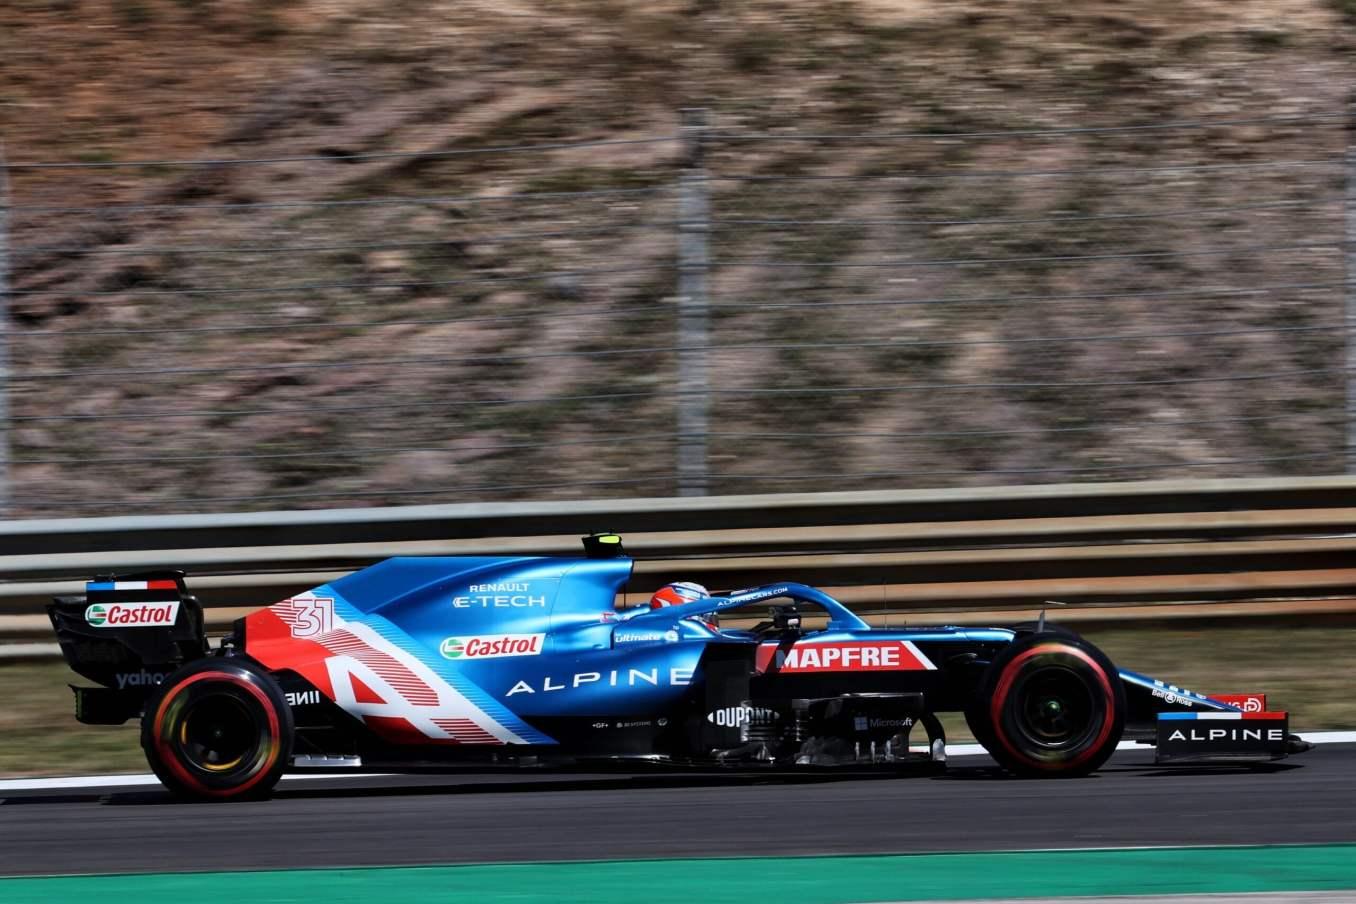 Alpine F1 Team GRAND PRIX HEINEKEN DU PORTUGAL Alonso Ocon 2021 A521 17 scaled   Alpine F1 Team : des essais convaincants au Grand Prix Heineken du Portugal